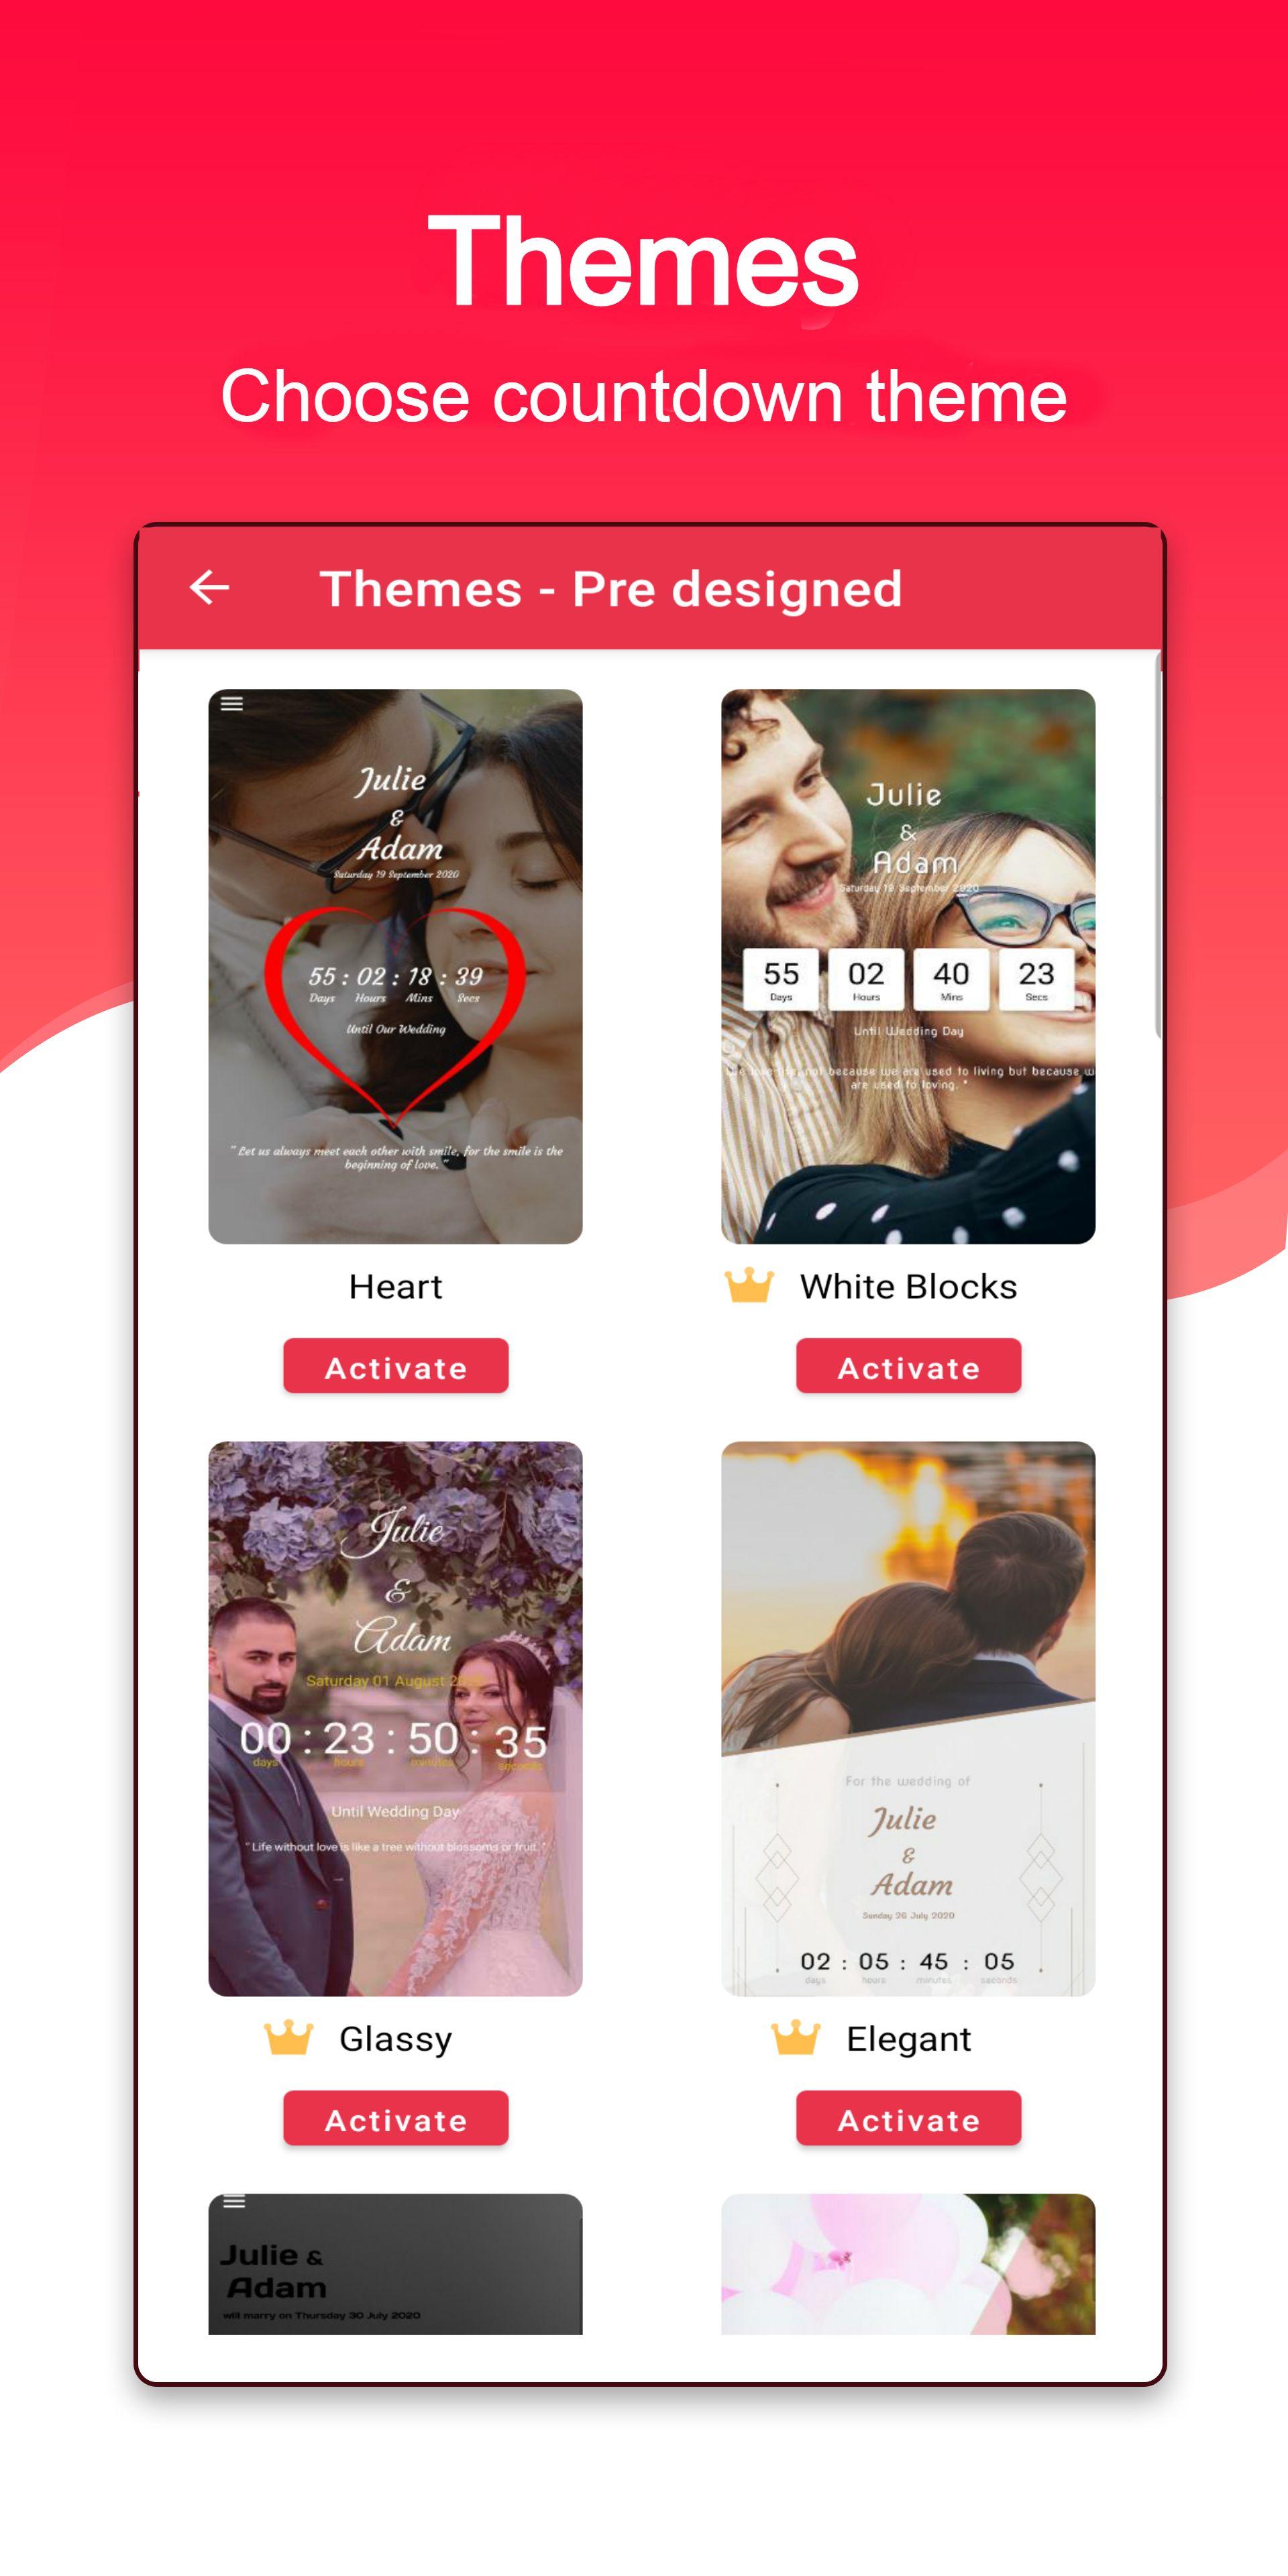 Wedding Countdown Themes In 2020 Wedding Countdown Theme Themes Themes